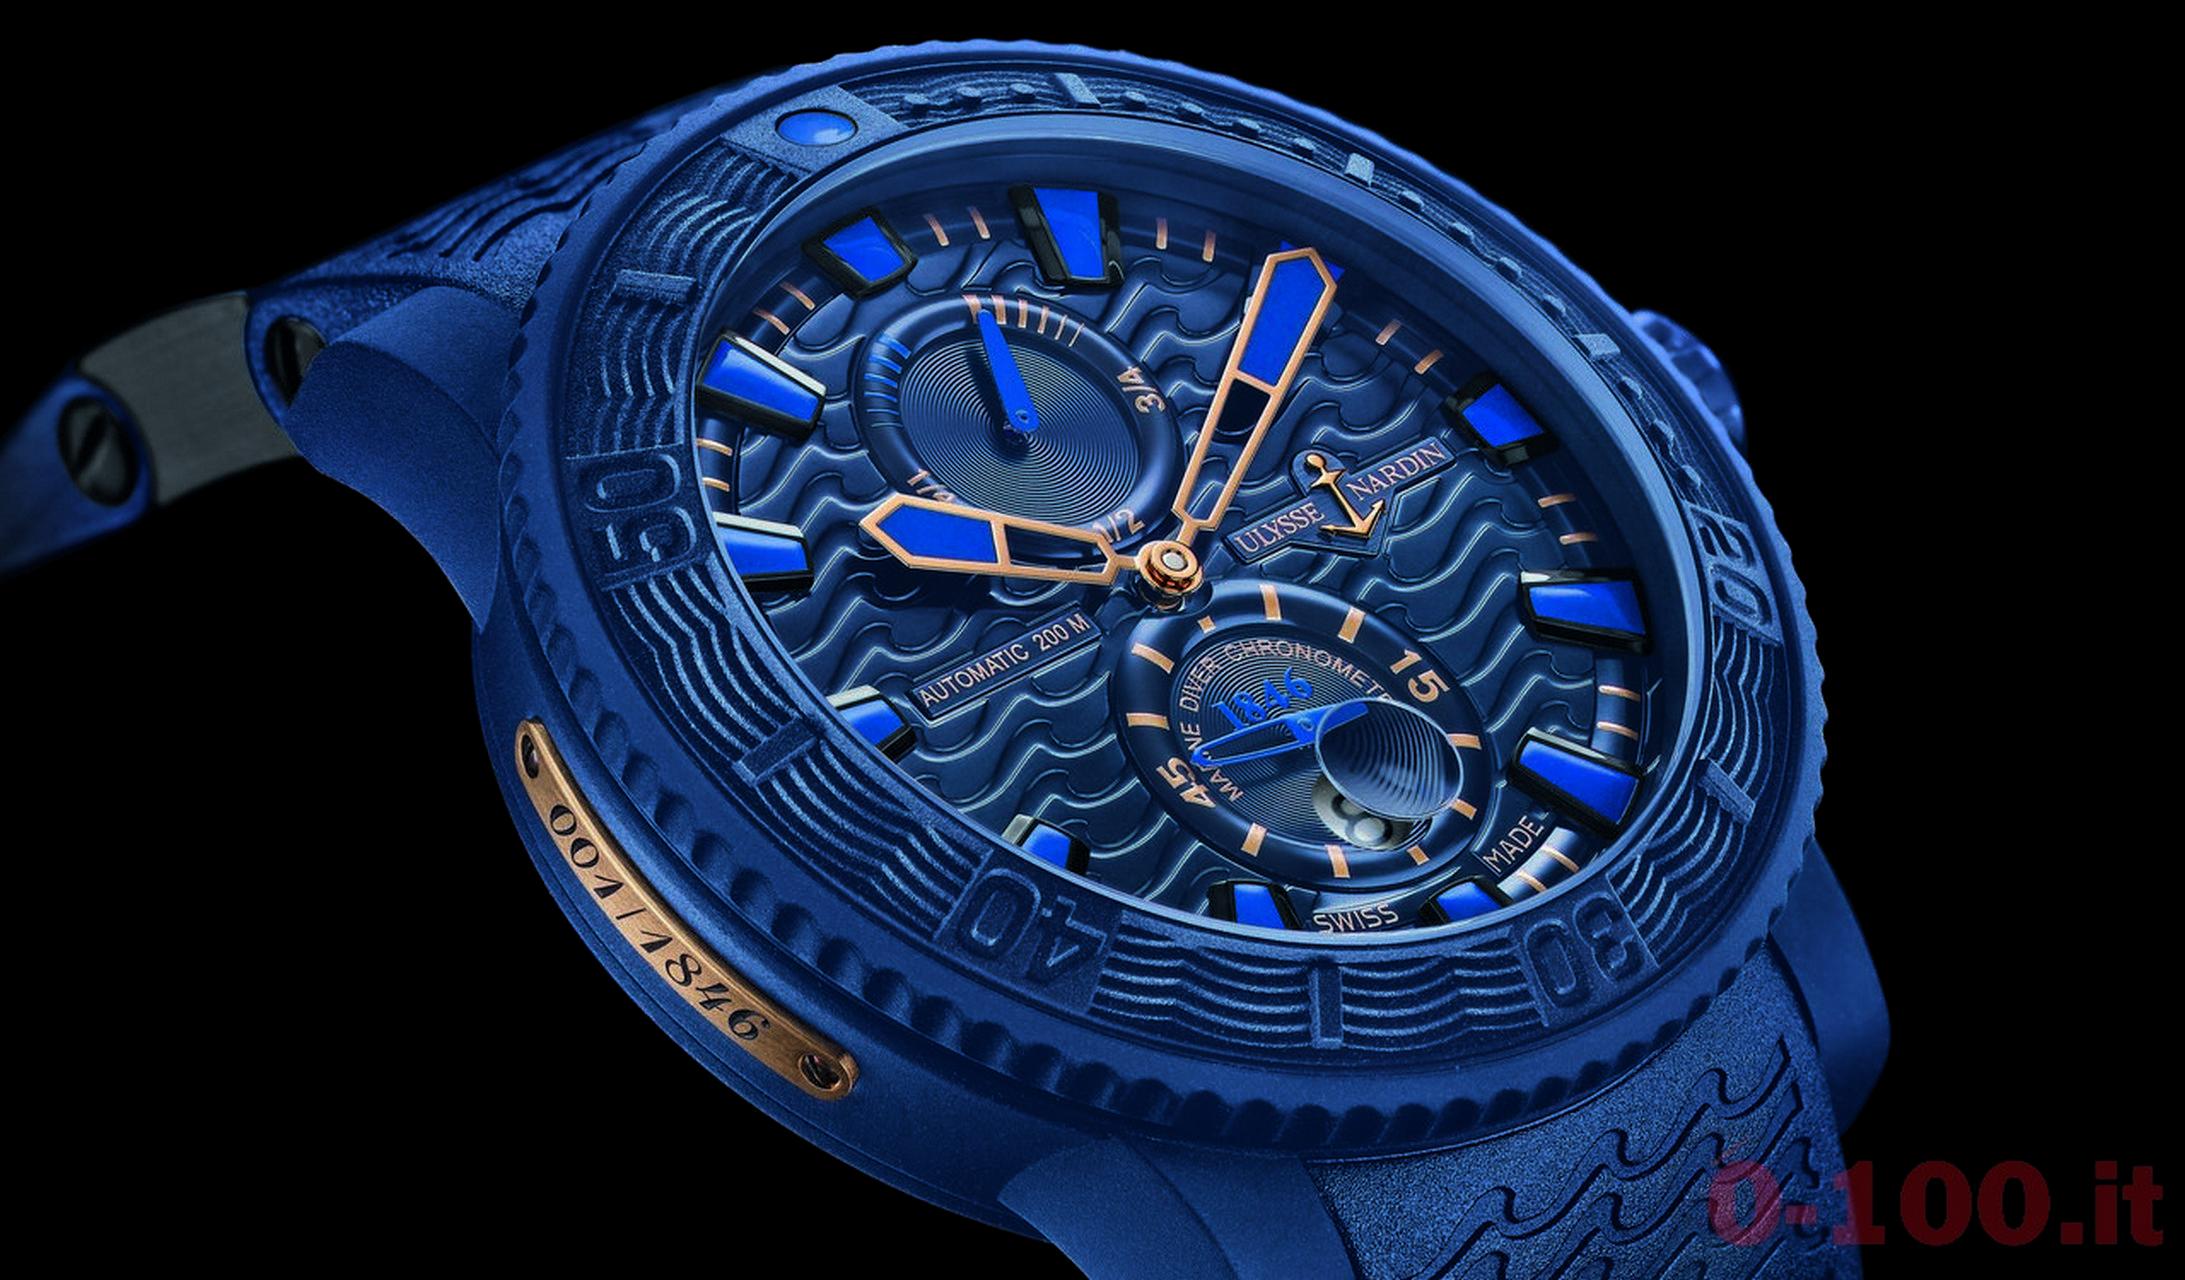 ulysse-nardin-blue-ocean-limited-edition-ref-263-99le-3c-price_0-1001